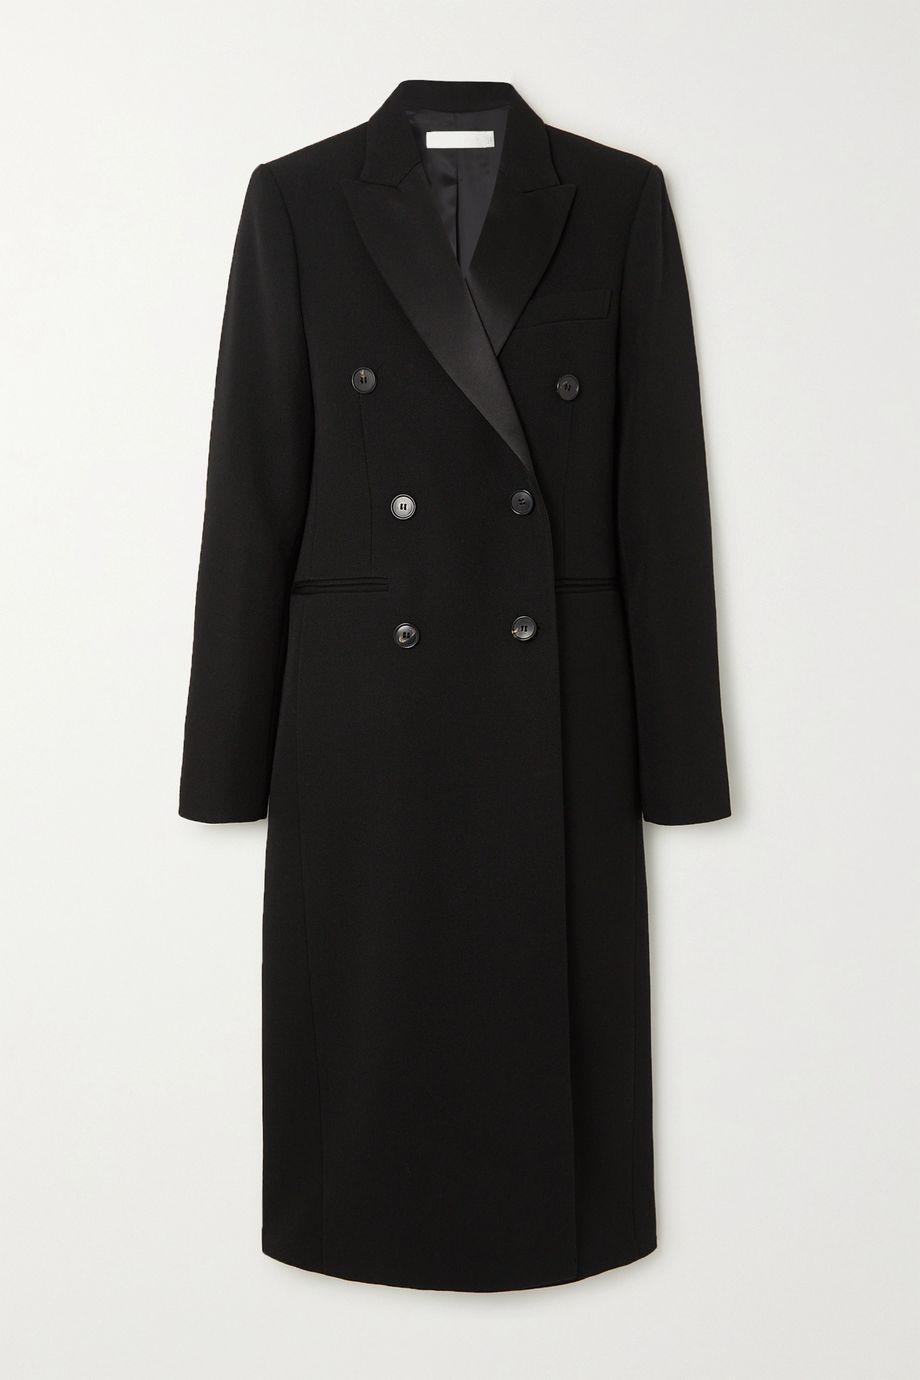 Victoria Beckham Satin-trimmed double-breasted wool-gabardine coat